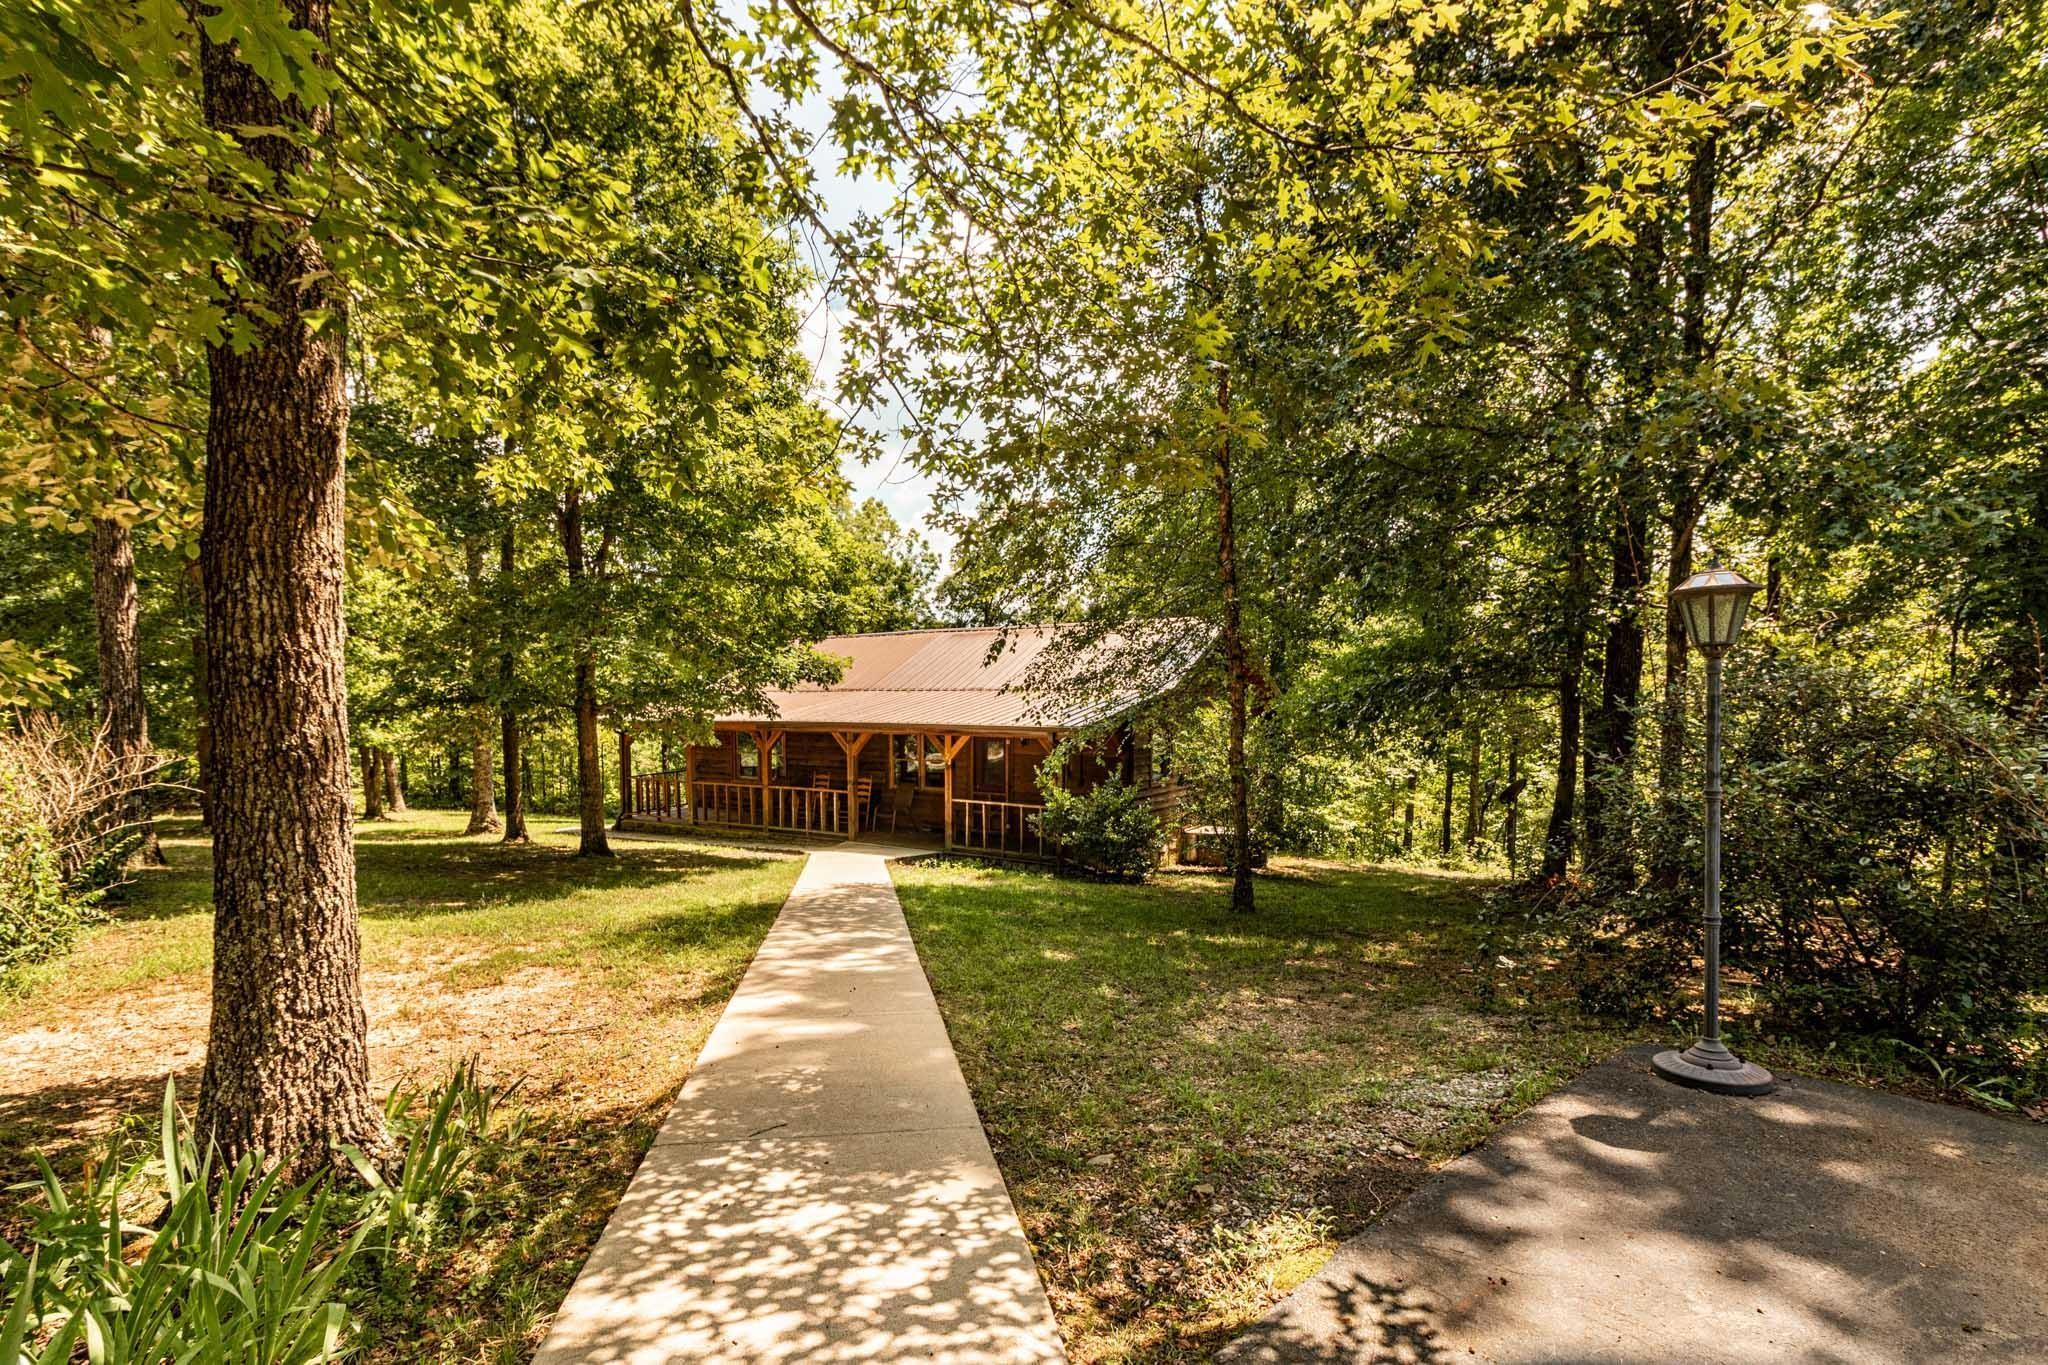 122 Emerald Dr, Hohenwald, TN 38462 - Hohenwald, TN real estate listing